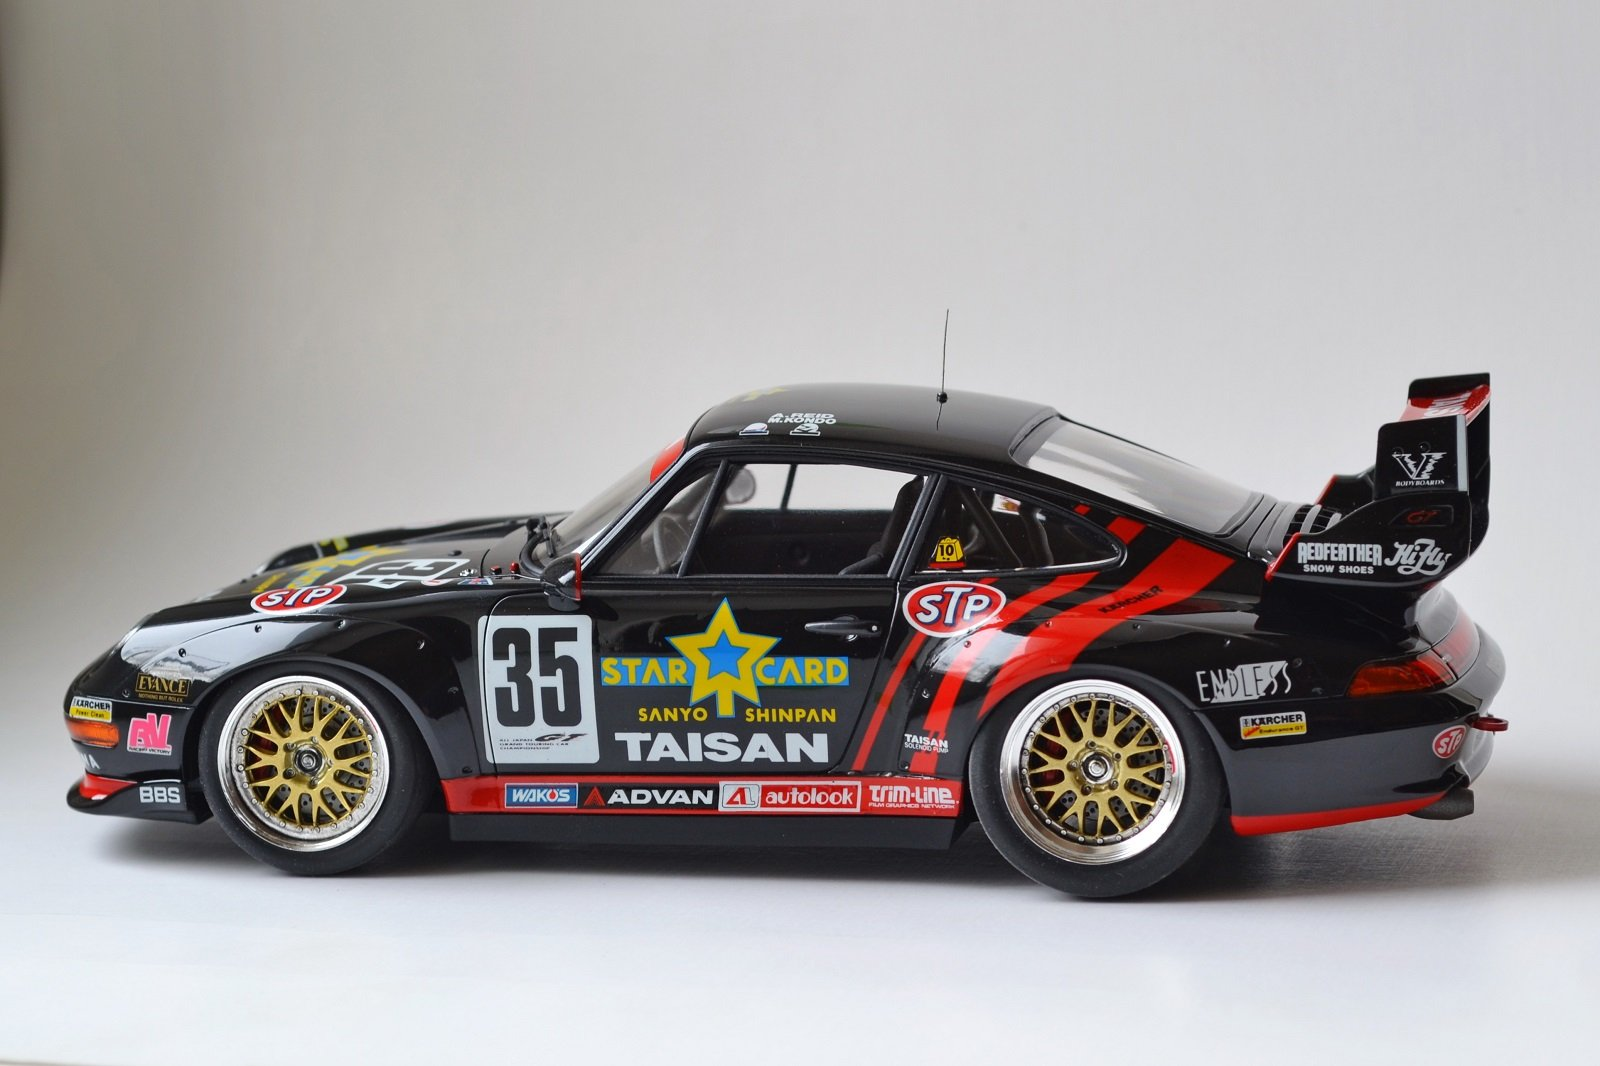 Porsche 911 GT2 Taisan Starcard